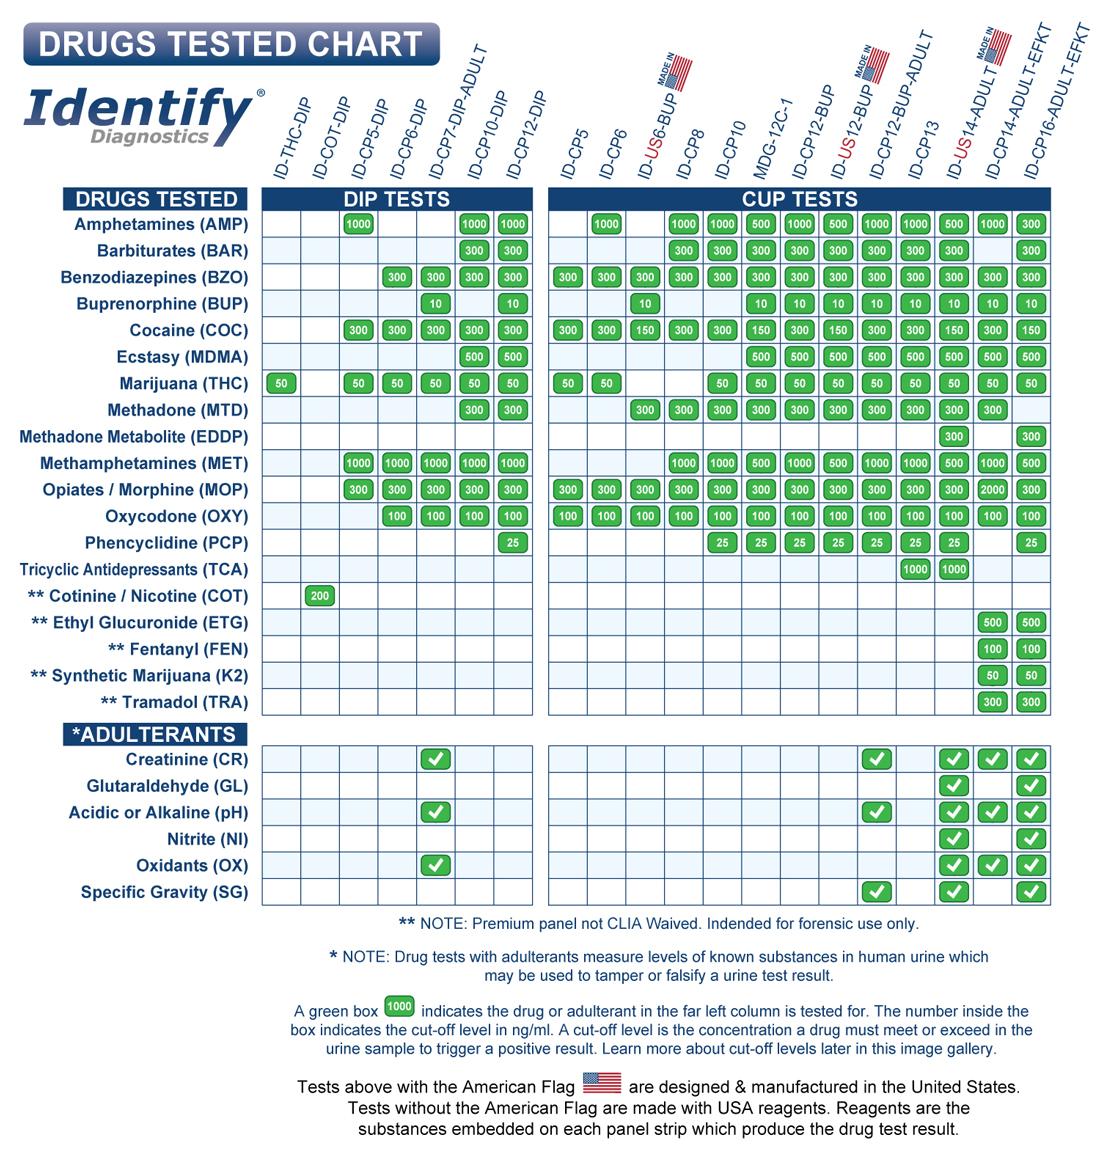 identify-diagnostics-urine-drug-tests-drugs-tested-chart-2019-1100x1161.jpg